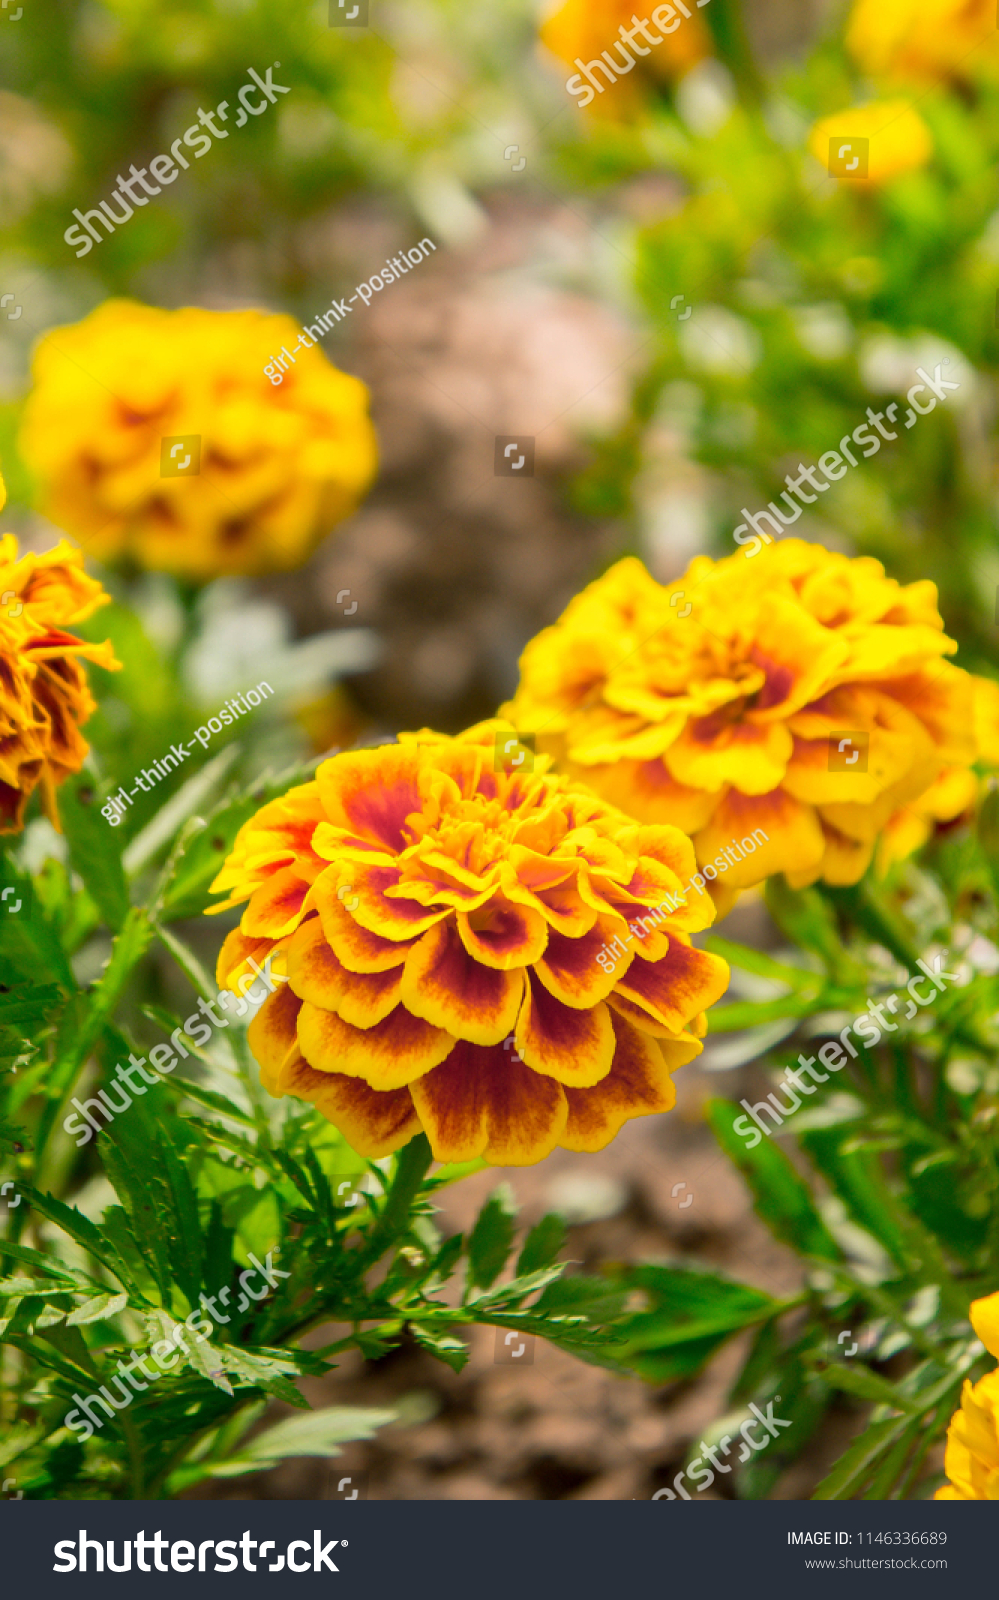 Marigold flowers garden on summer yellow stock photo edit now marigold flowers in the garden on summer yellow flowers beautiful flowers on summer in izmirmasajfo